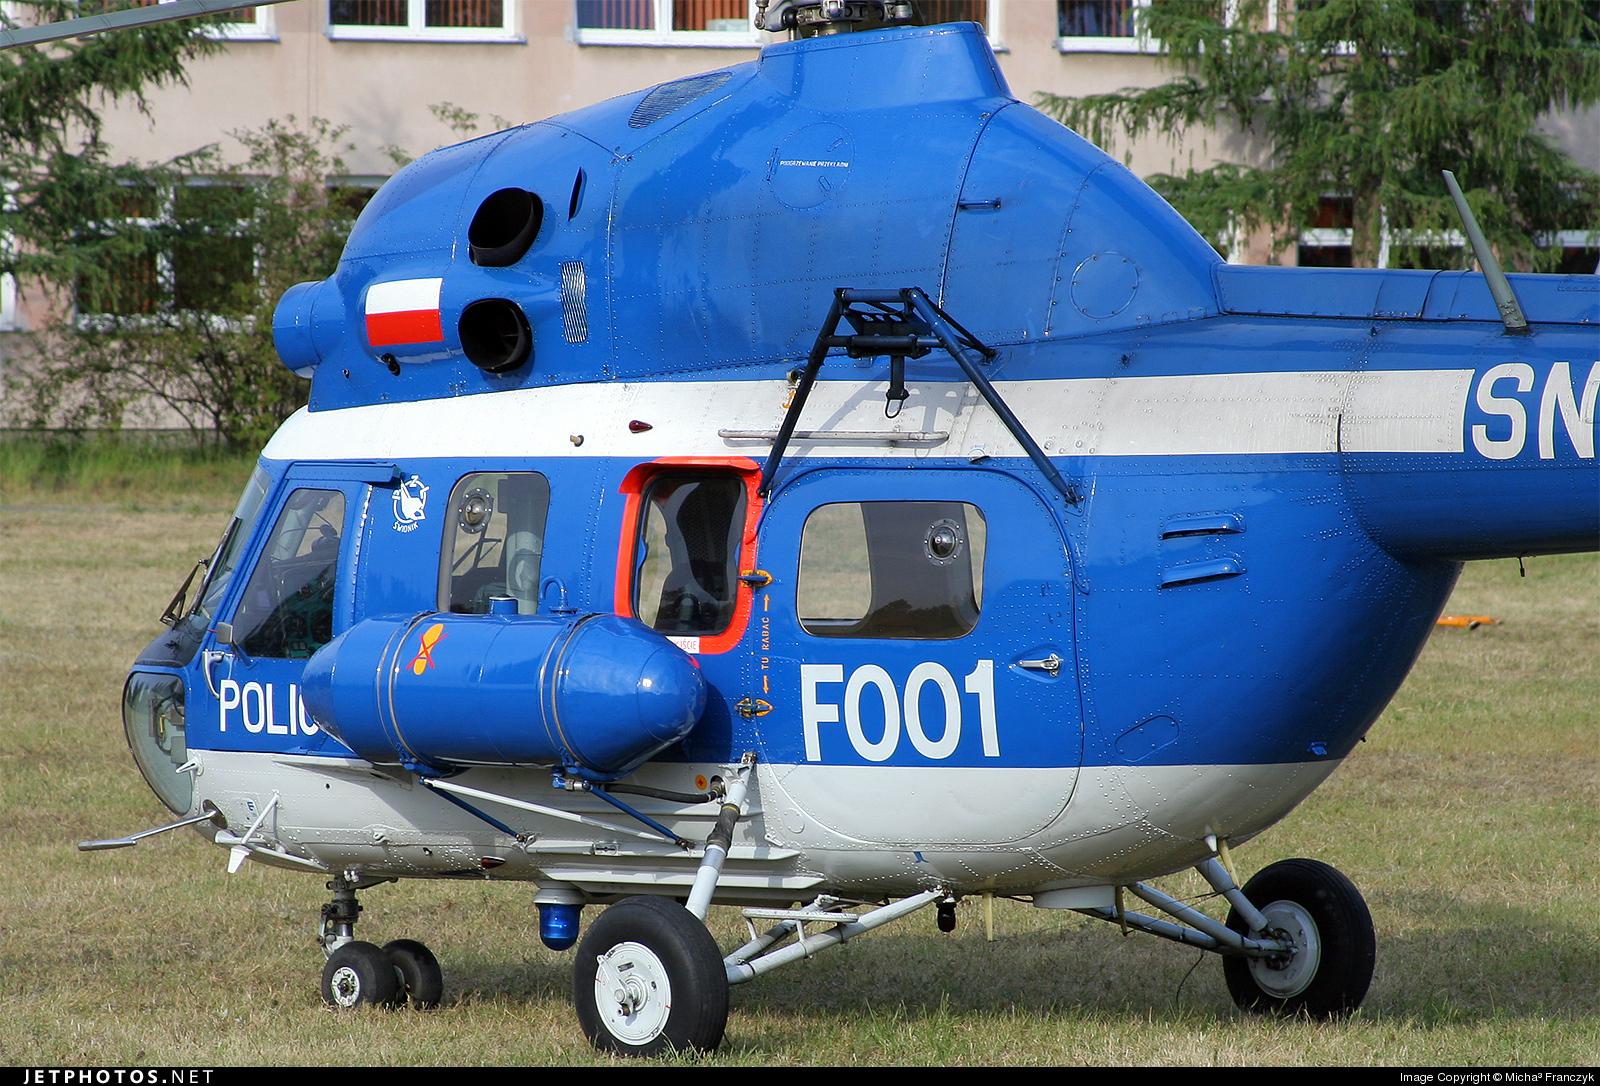 SN-09XP - PZL-Swidnik Mi-2 Hoplite - Poland - Police